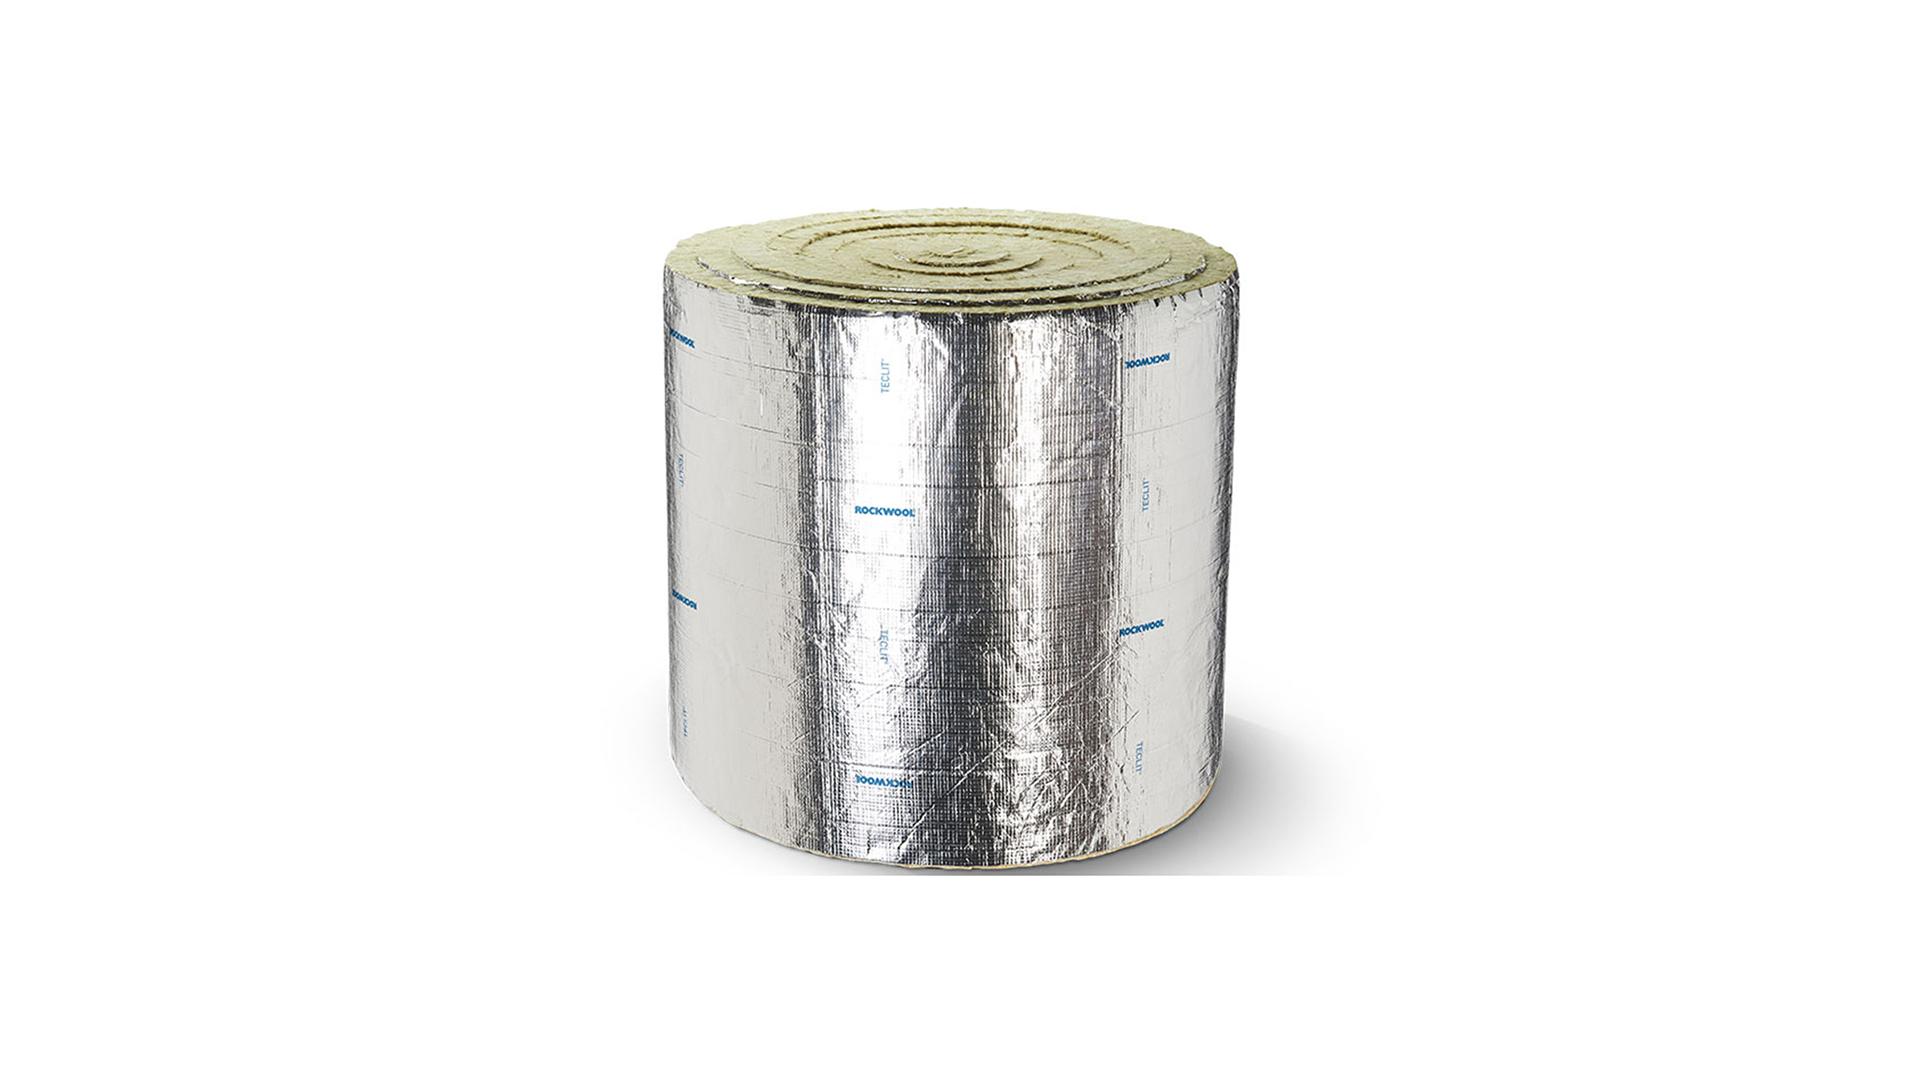 TECLIT LM 200, productfoto, HVAC, koude-isolatie